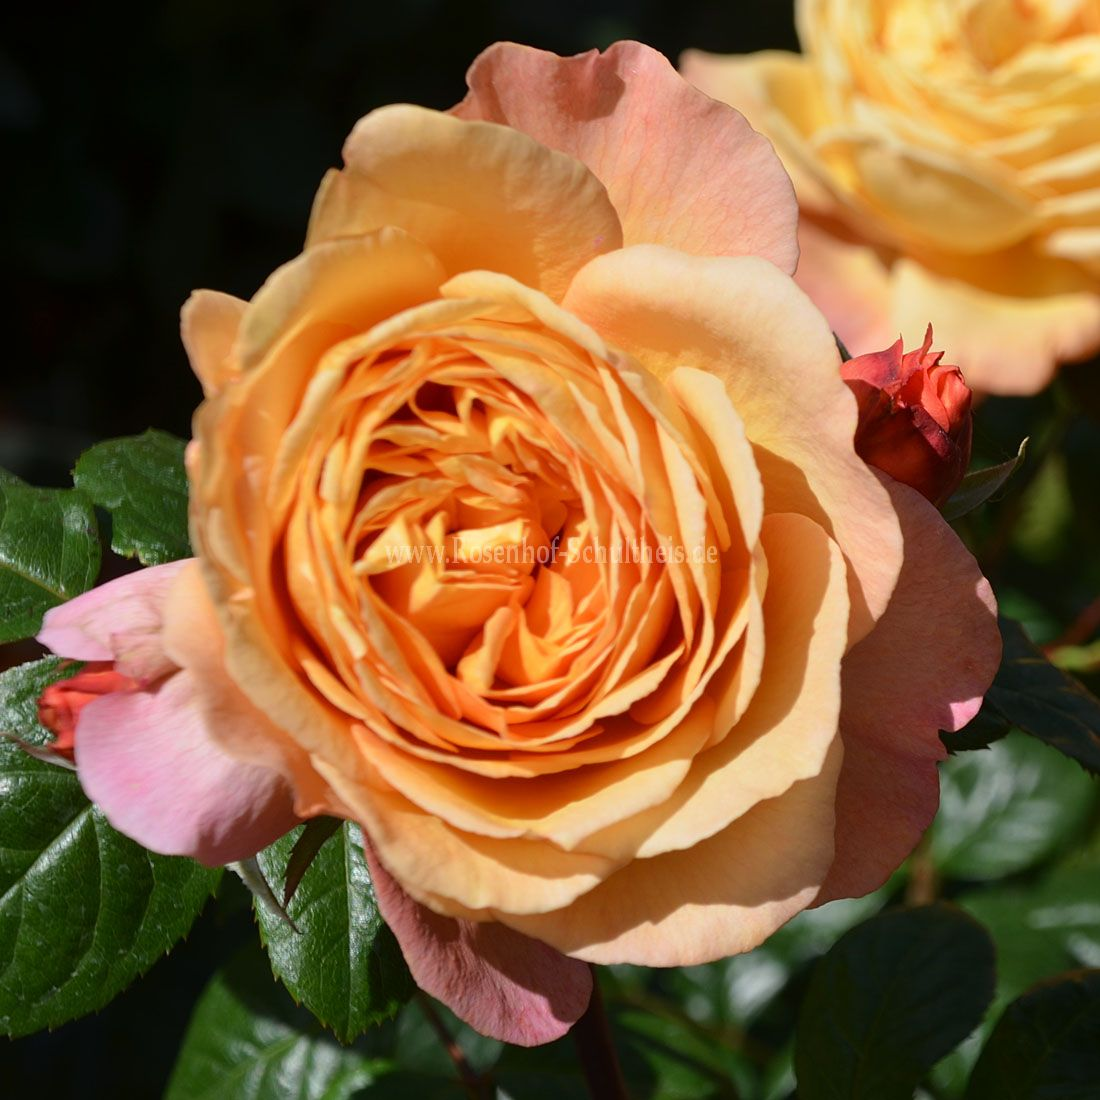 capri rosen online kaufen im rosenhof schultheis rosen online kaufen im rosenhof schultheis. Black Bedroom Furniture Sets. Home Design Ideas